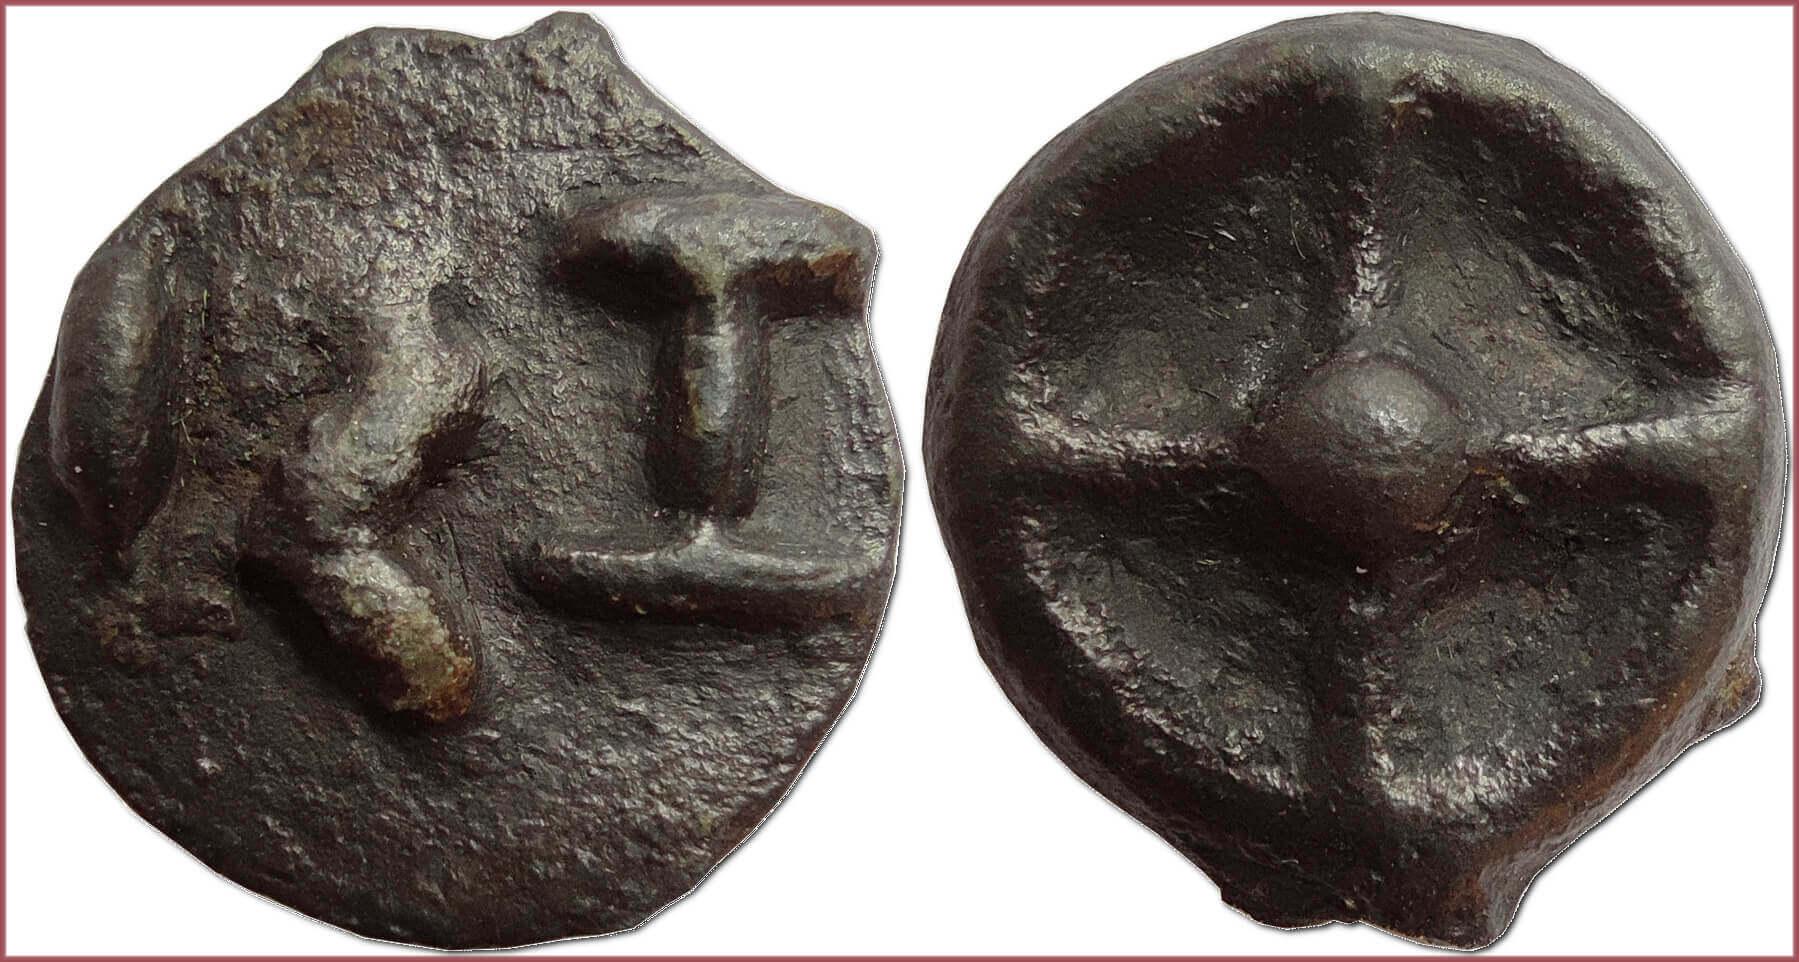 Wheel money /Wheel coin/, 500-400 BC: ancient city Istros